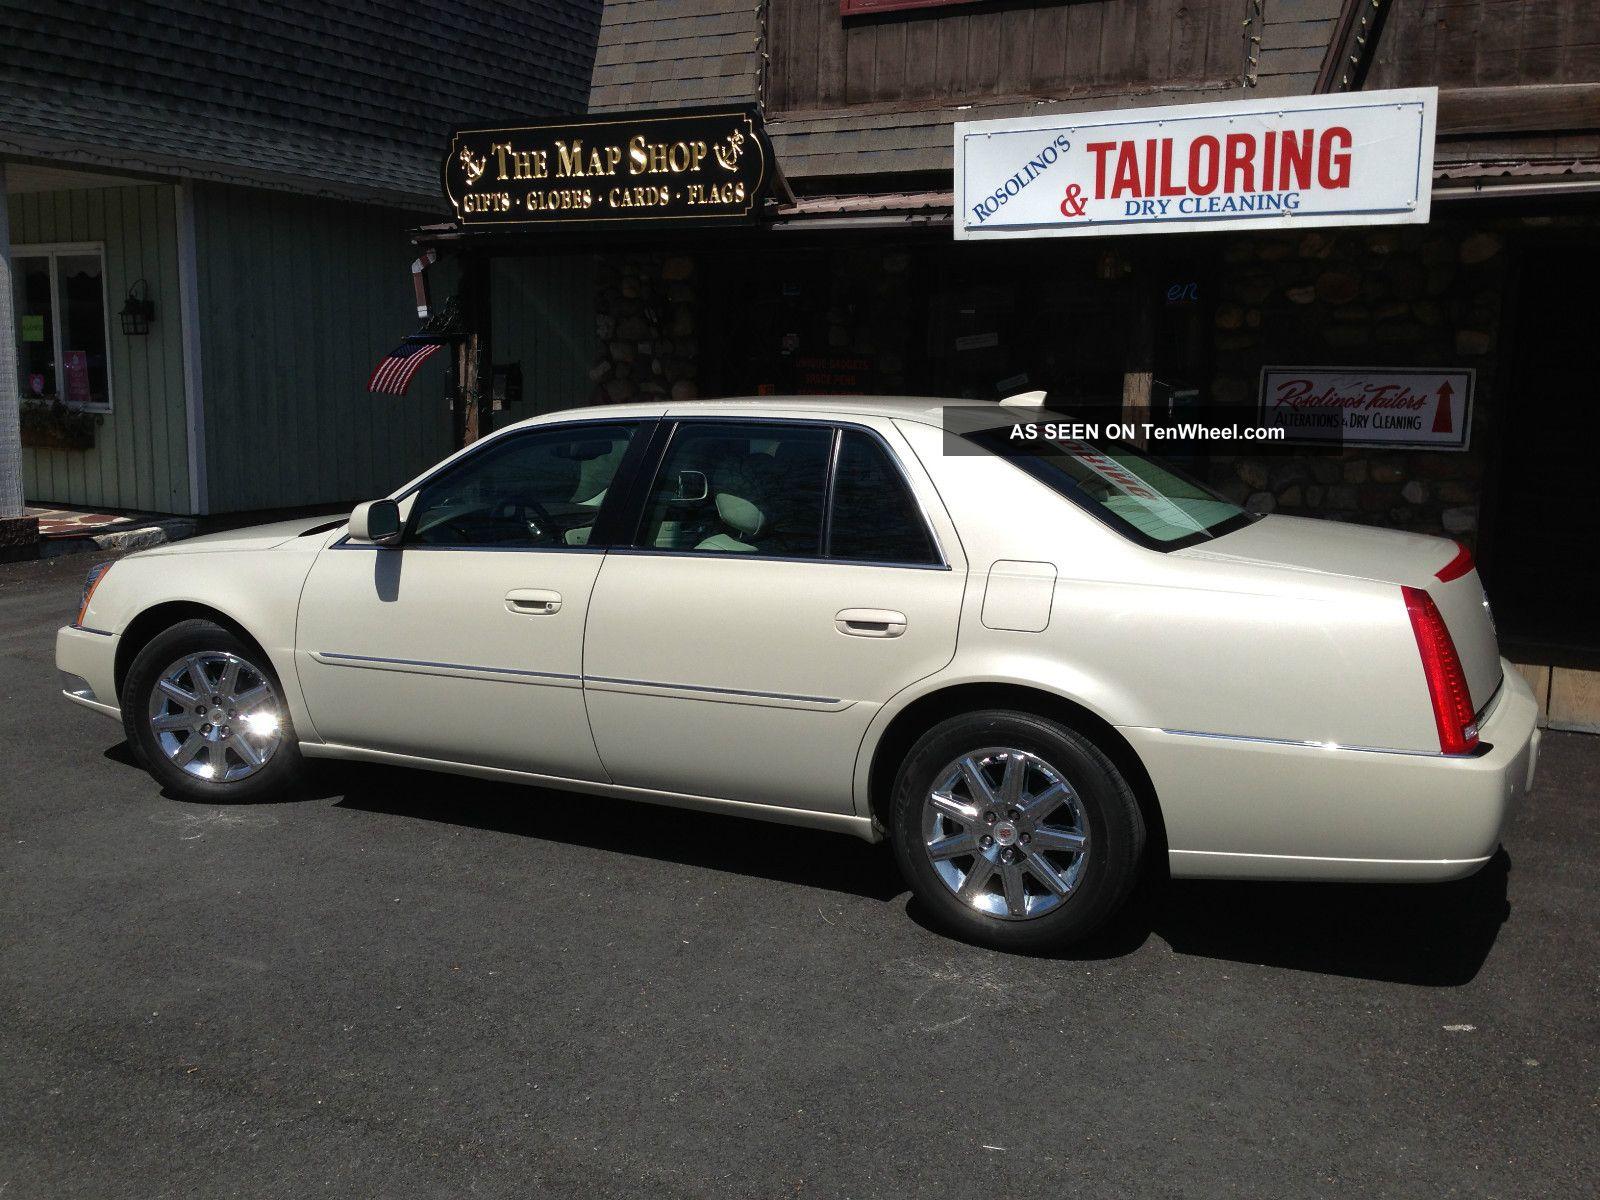 2011 Cadillac Dts Premium Collection Base Sedan 4 Door 4 6l